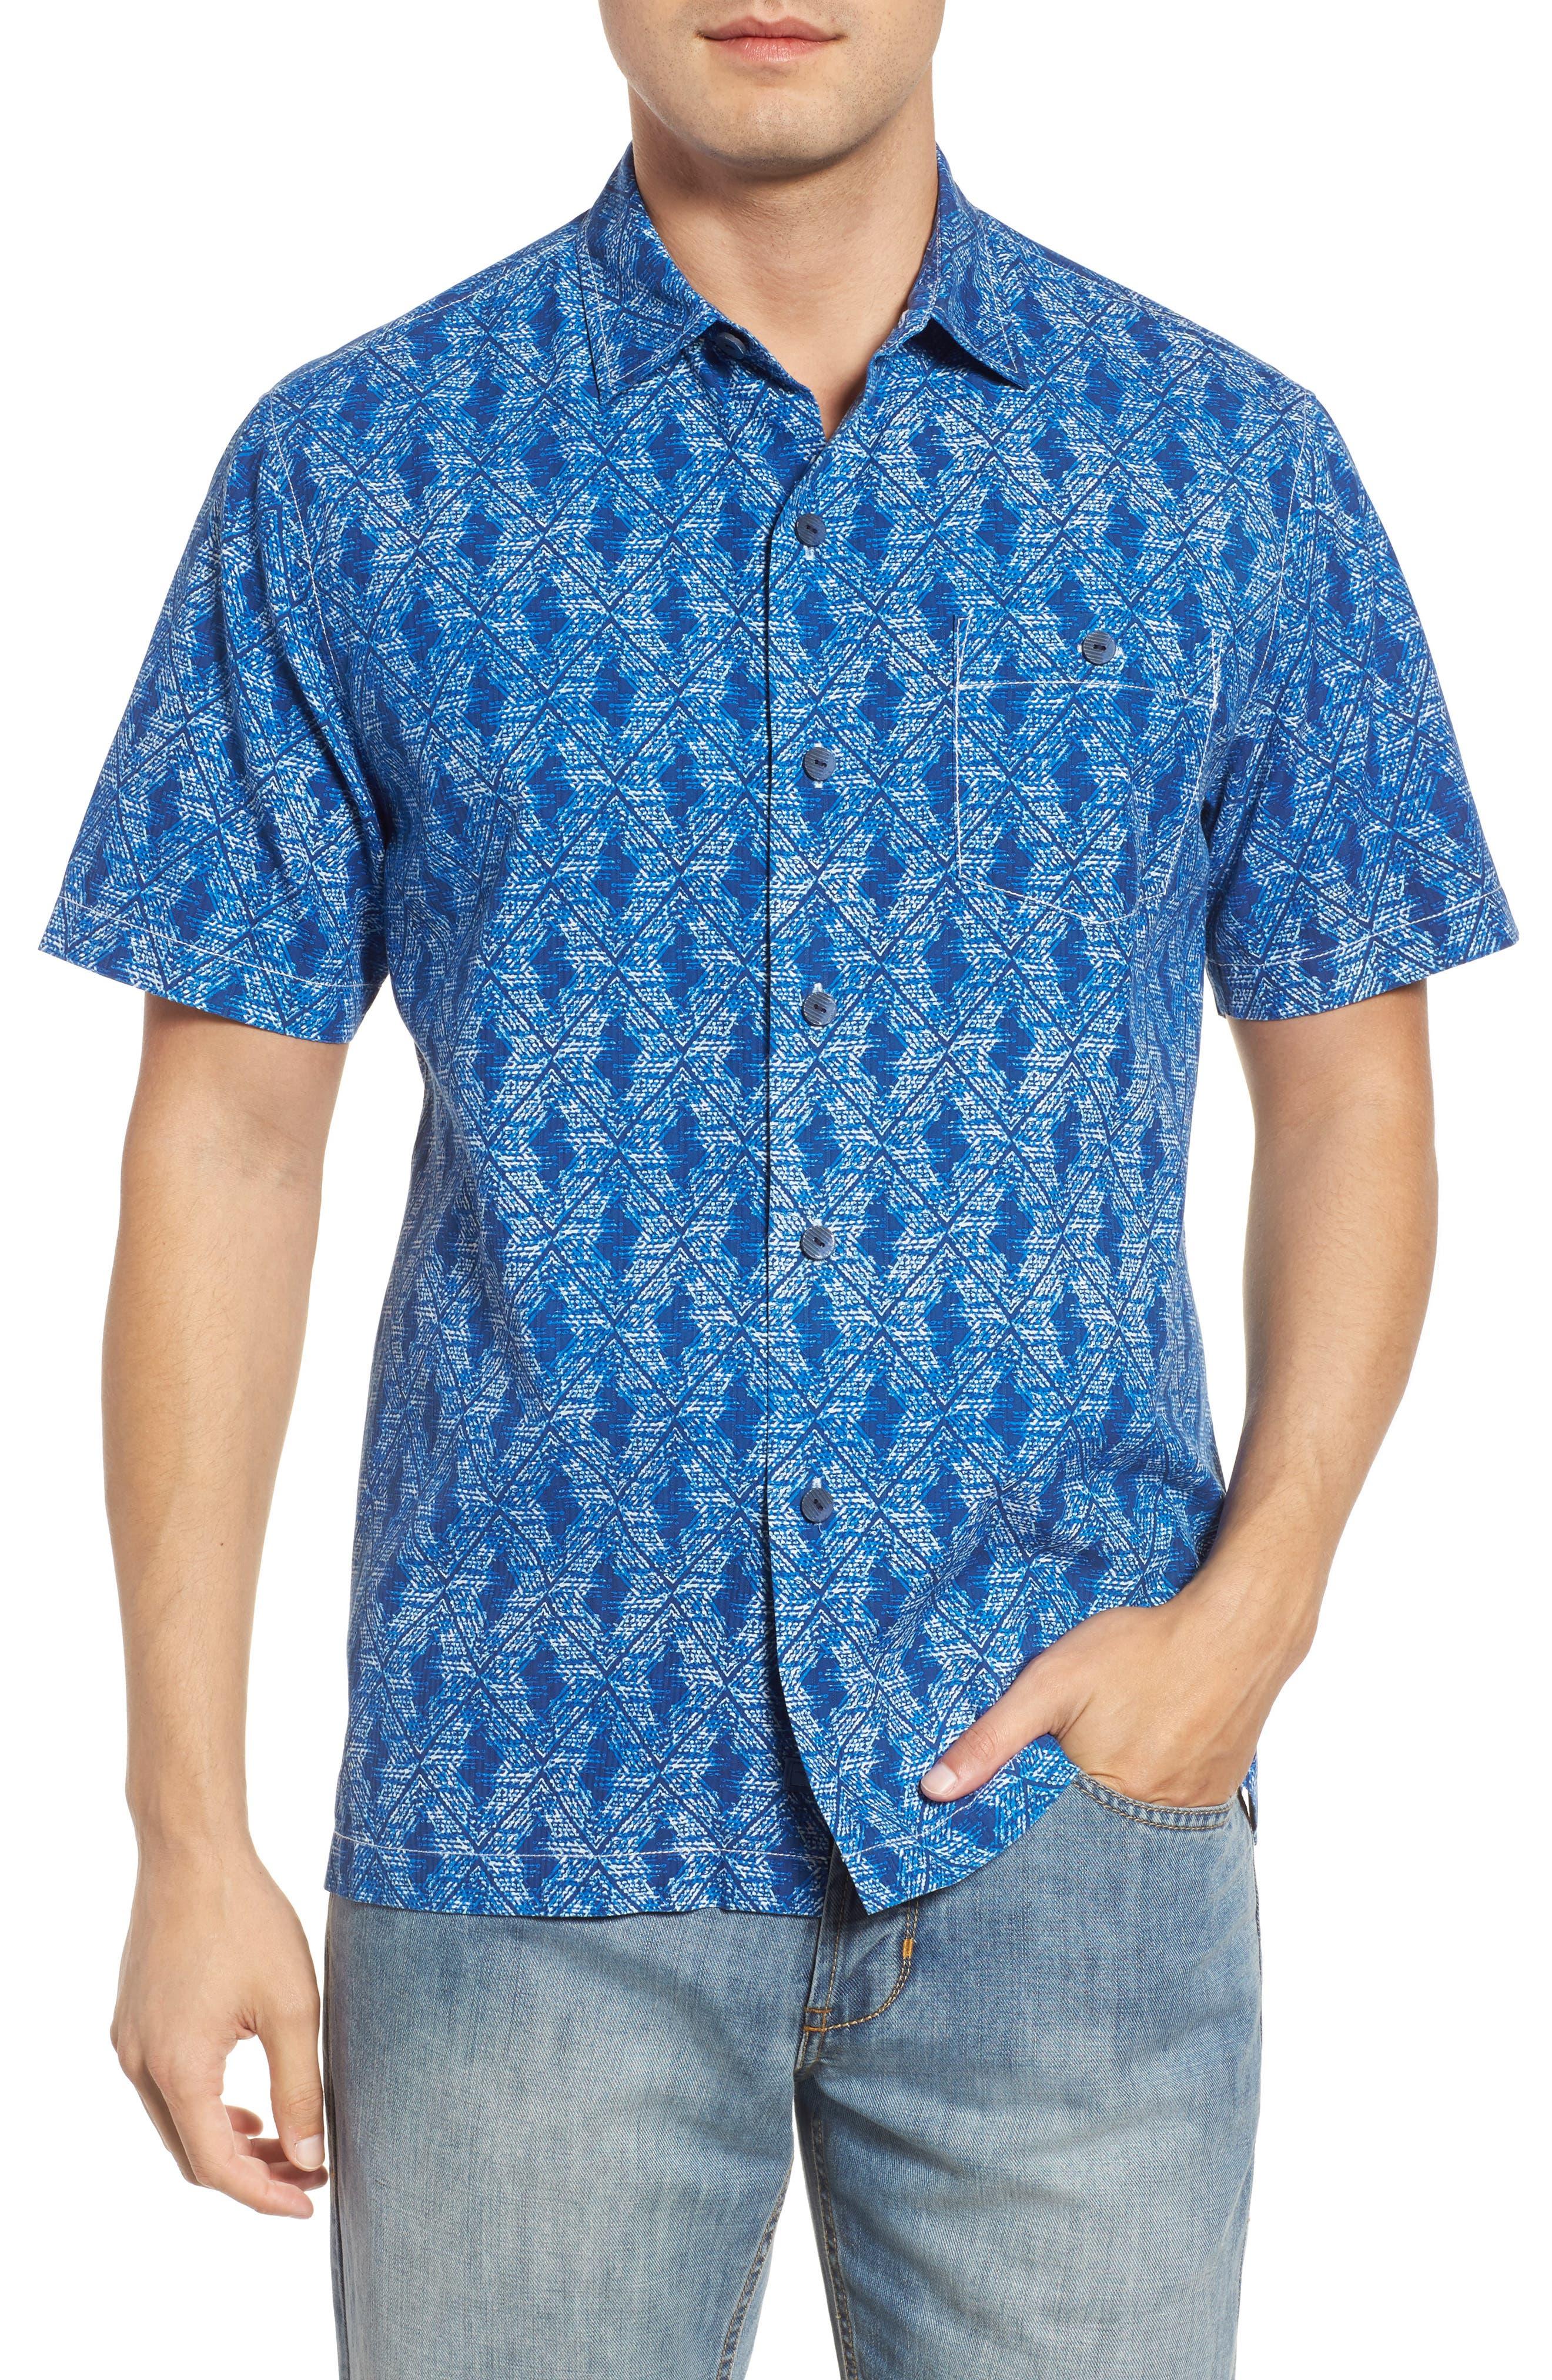 Alternate Image 1 Selected - Tommy Bahama Del Ray Diamond Sport Shirt